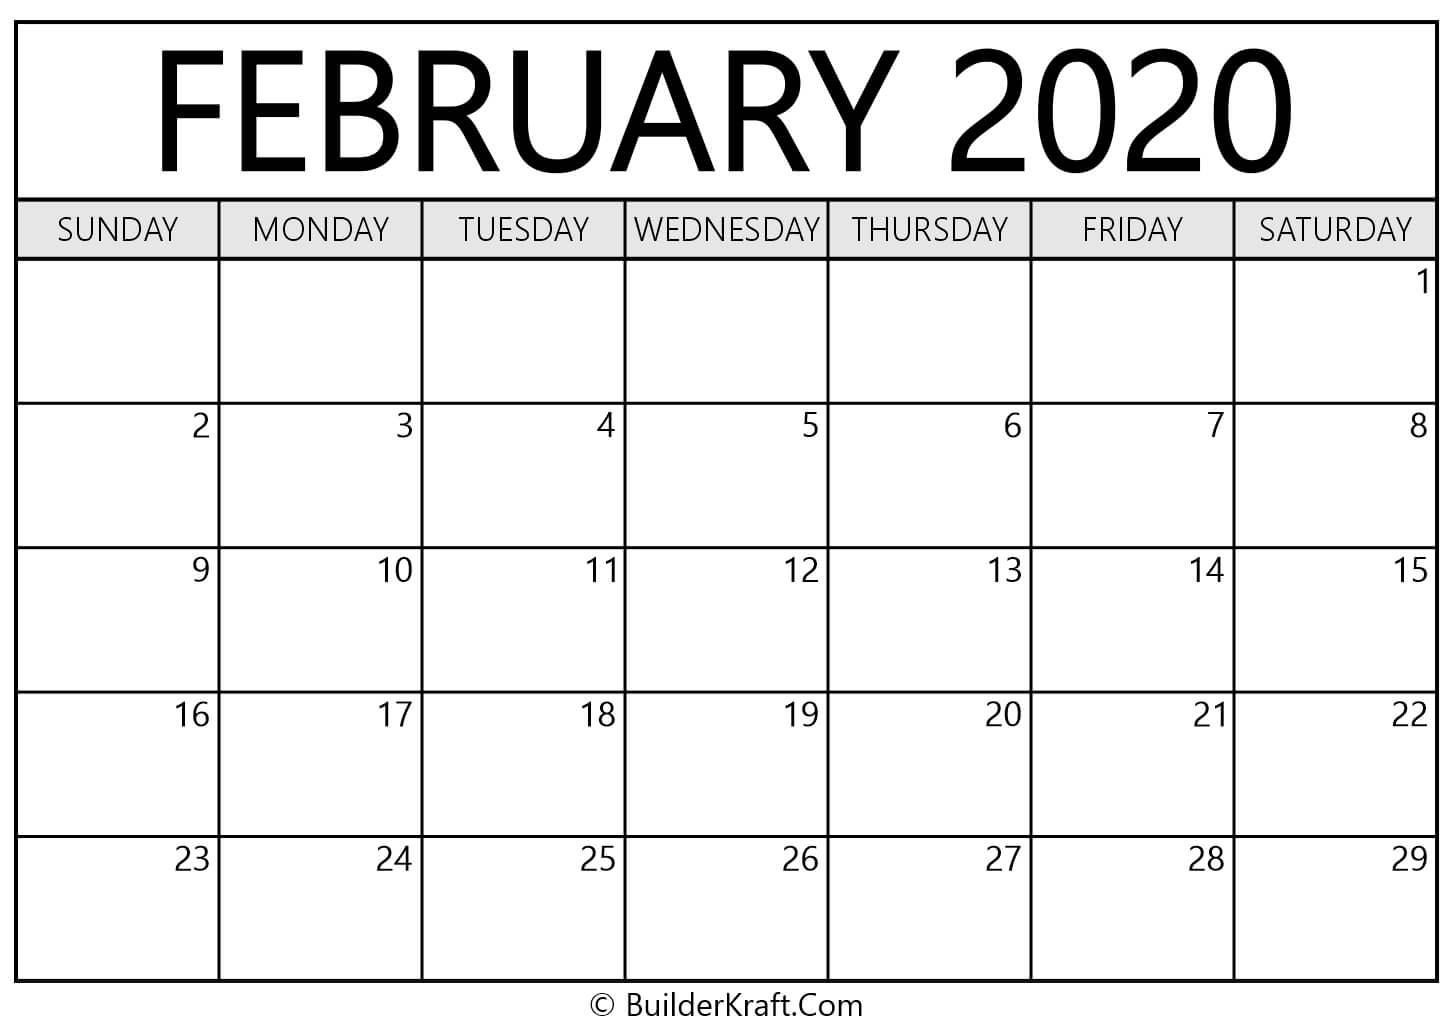 February 2020 Calendar Printable Template - BuilderKraft